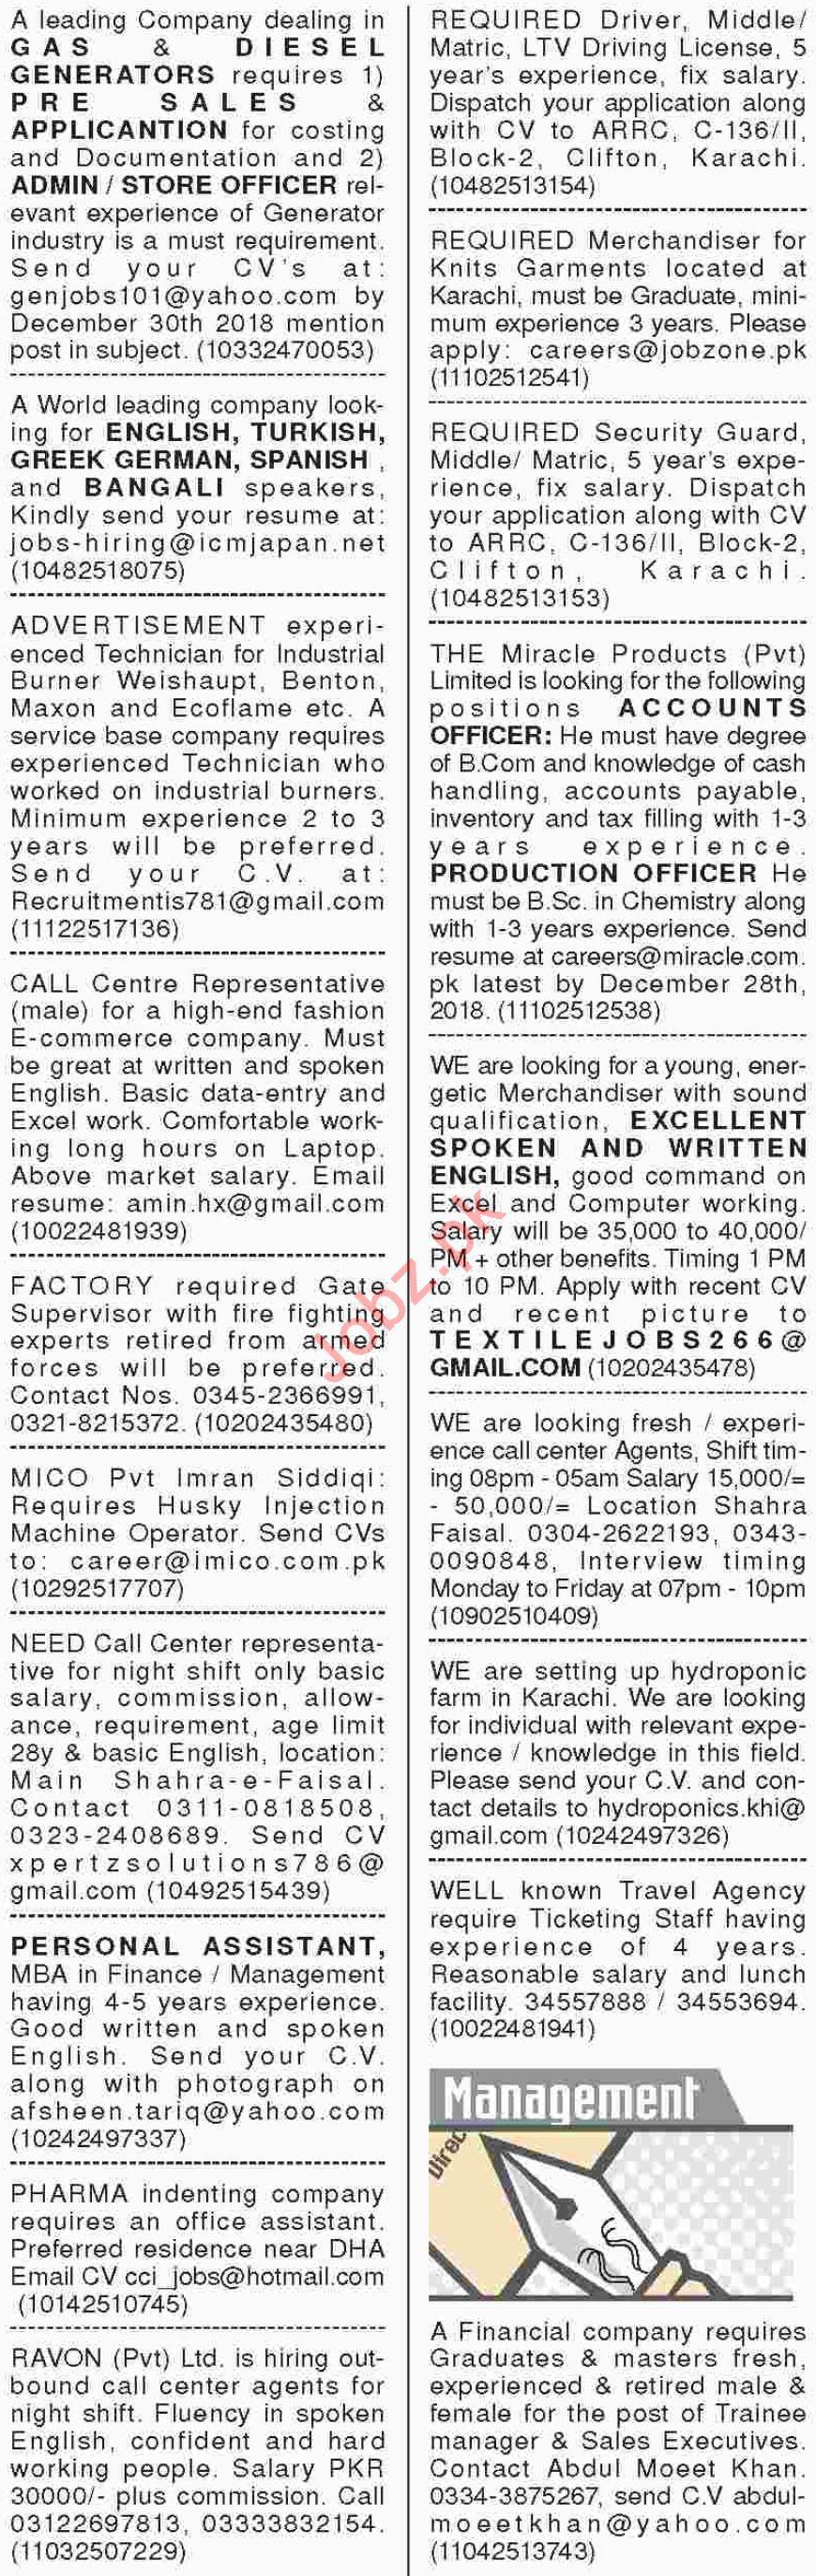 Dawn Sunday Newspaper General Classified Ads 23/12/2018